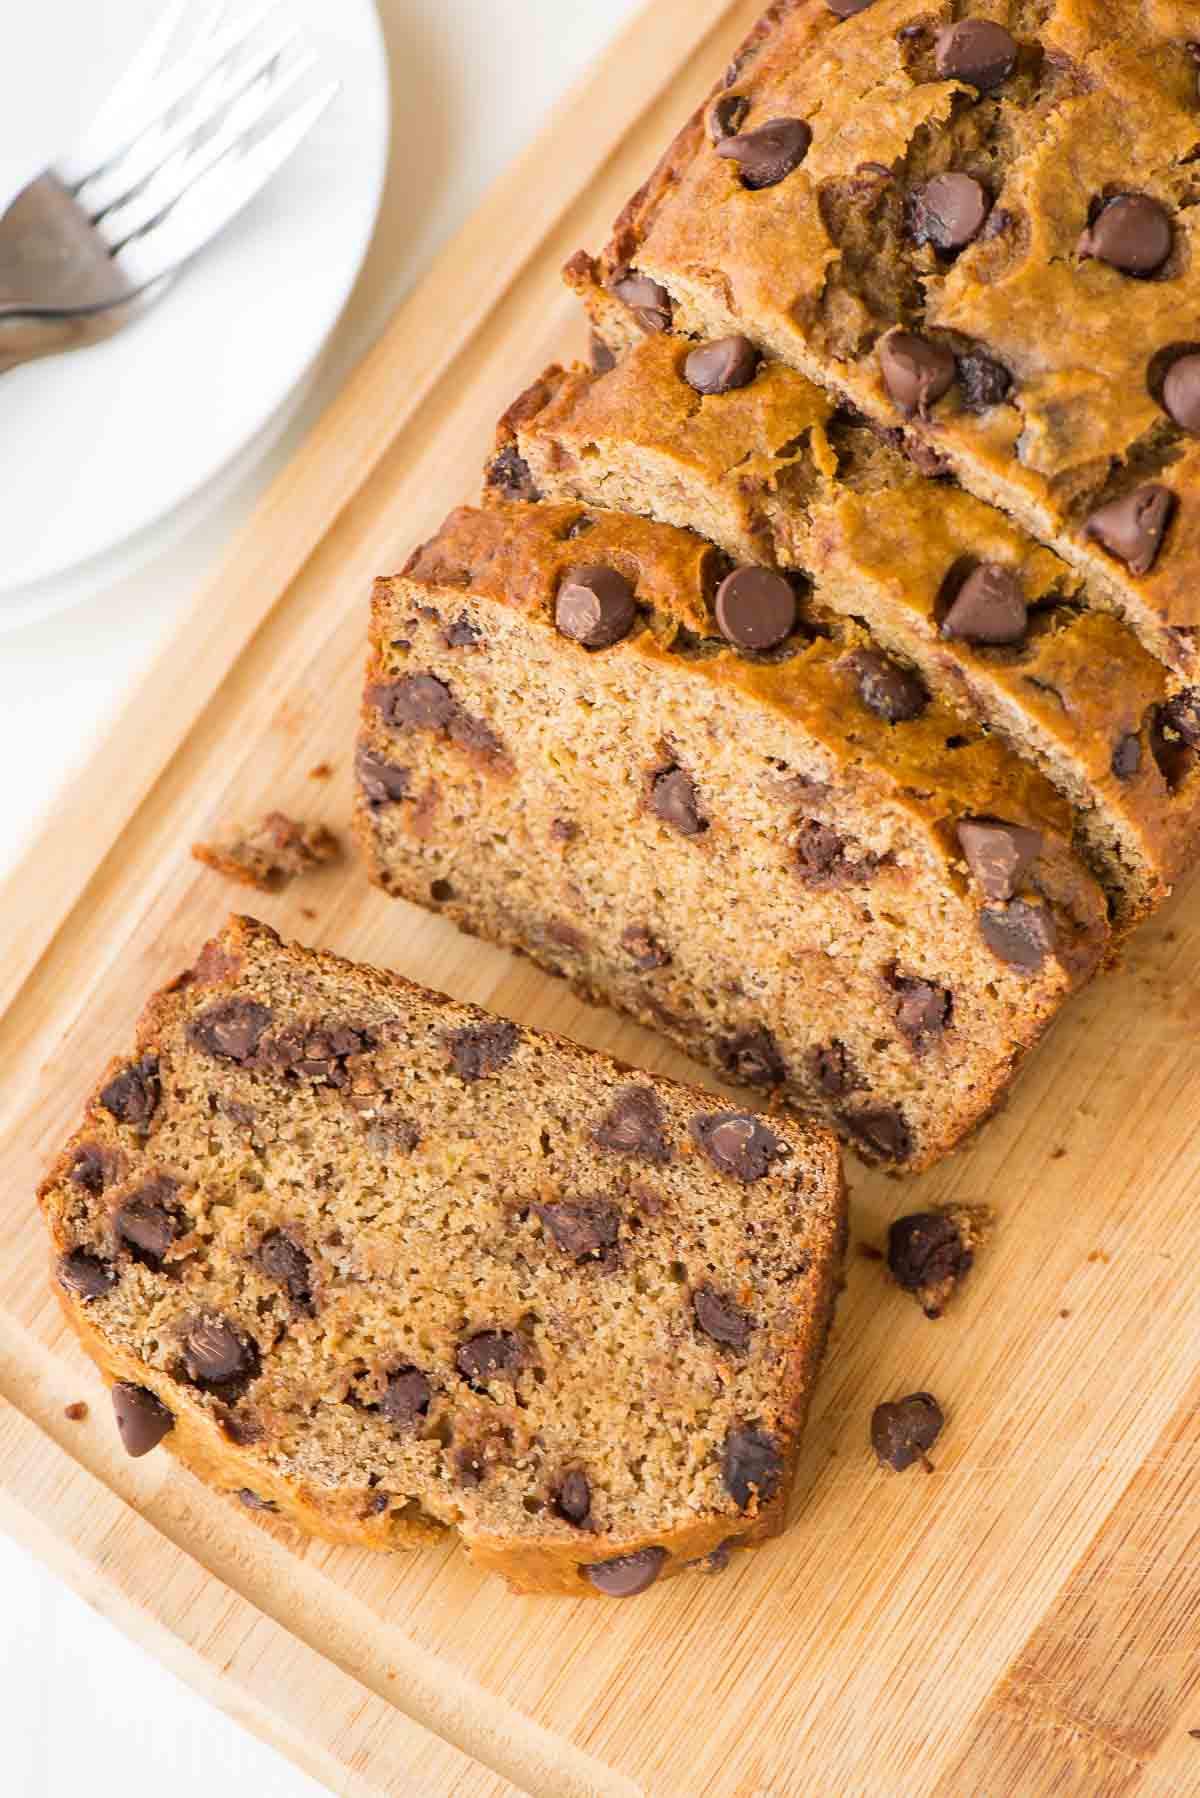 Easy Healthy Bread Recipes  Healthy Banana Bread Recipe with Chocolate Chips